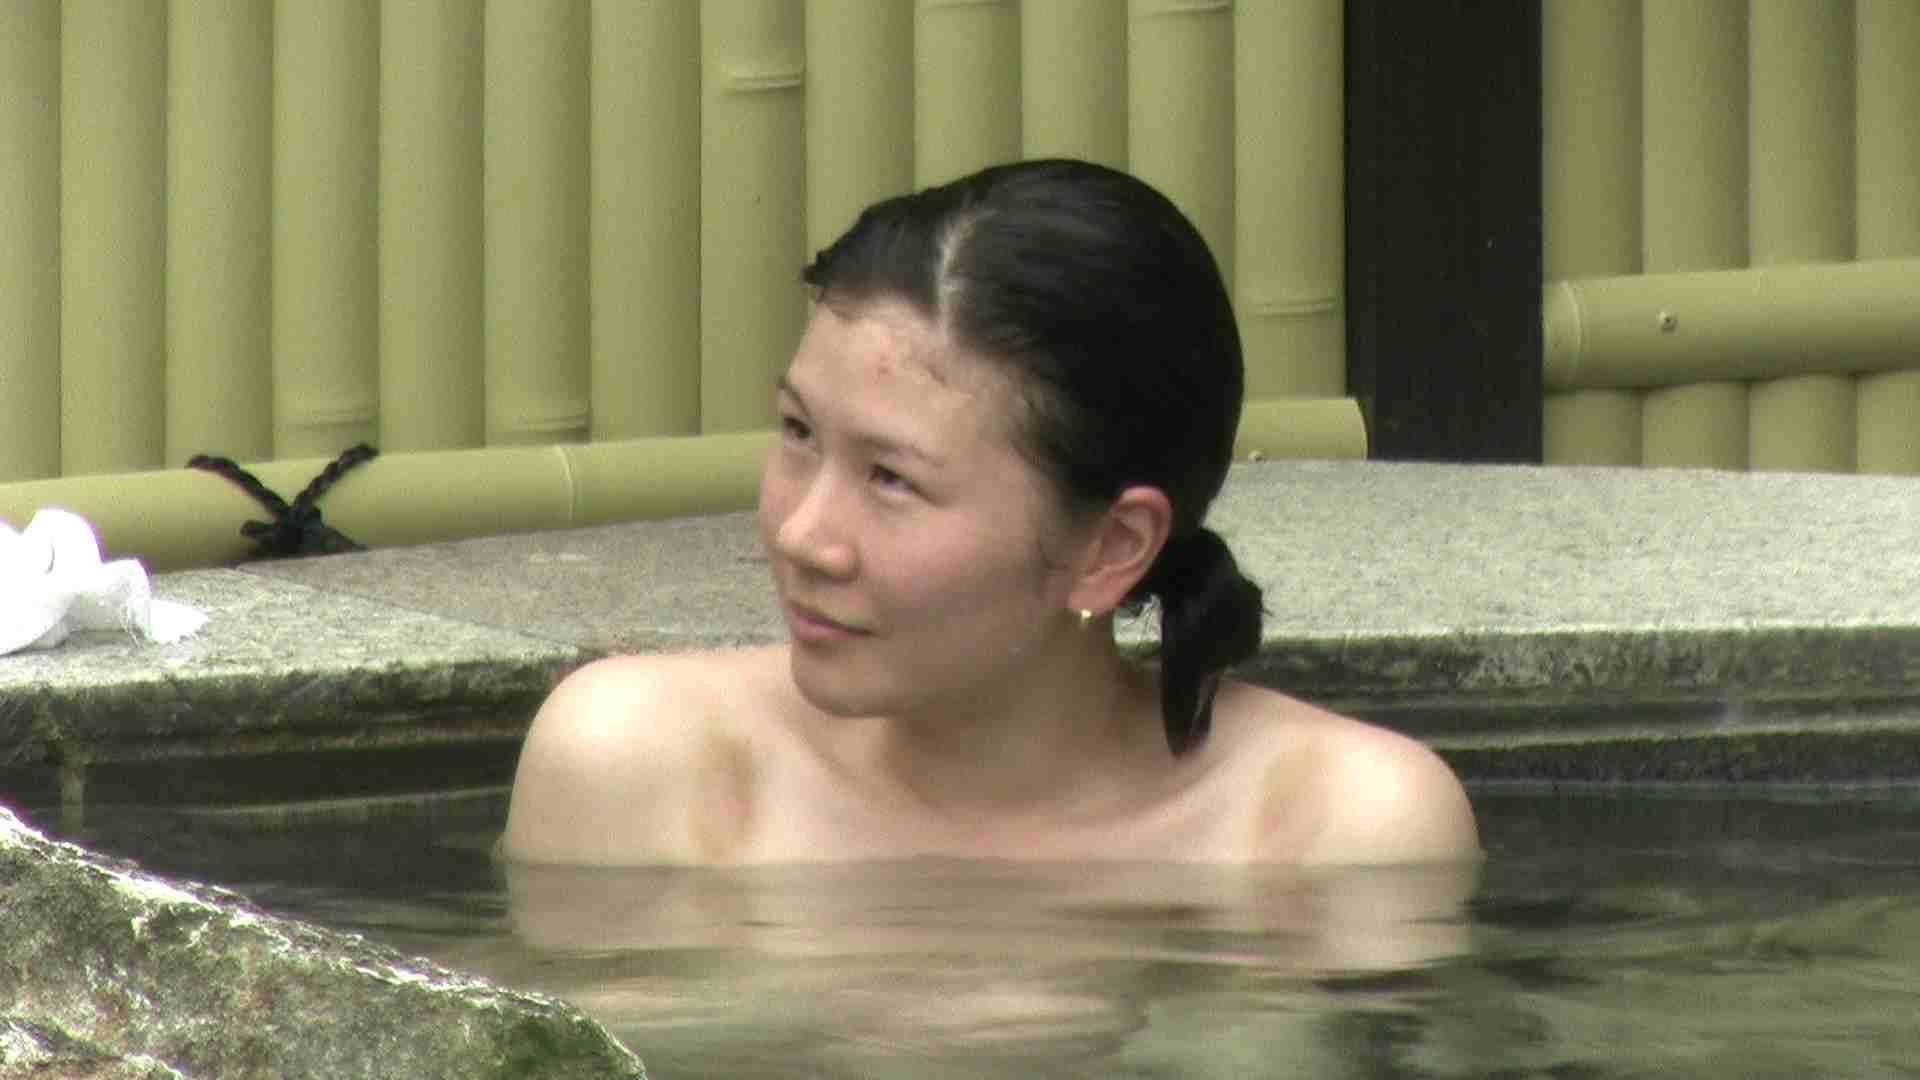 Aquaな露天風呂Vol.187 盗撮  63連発 30